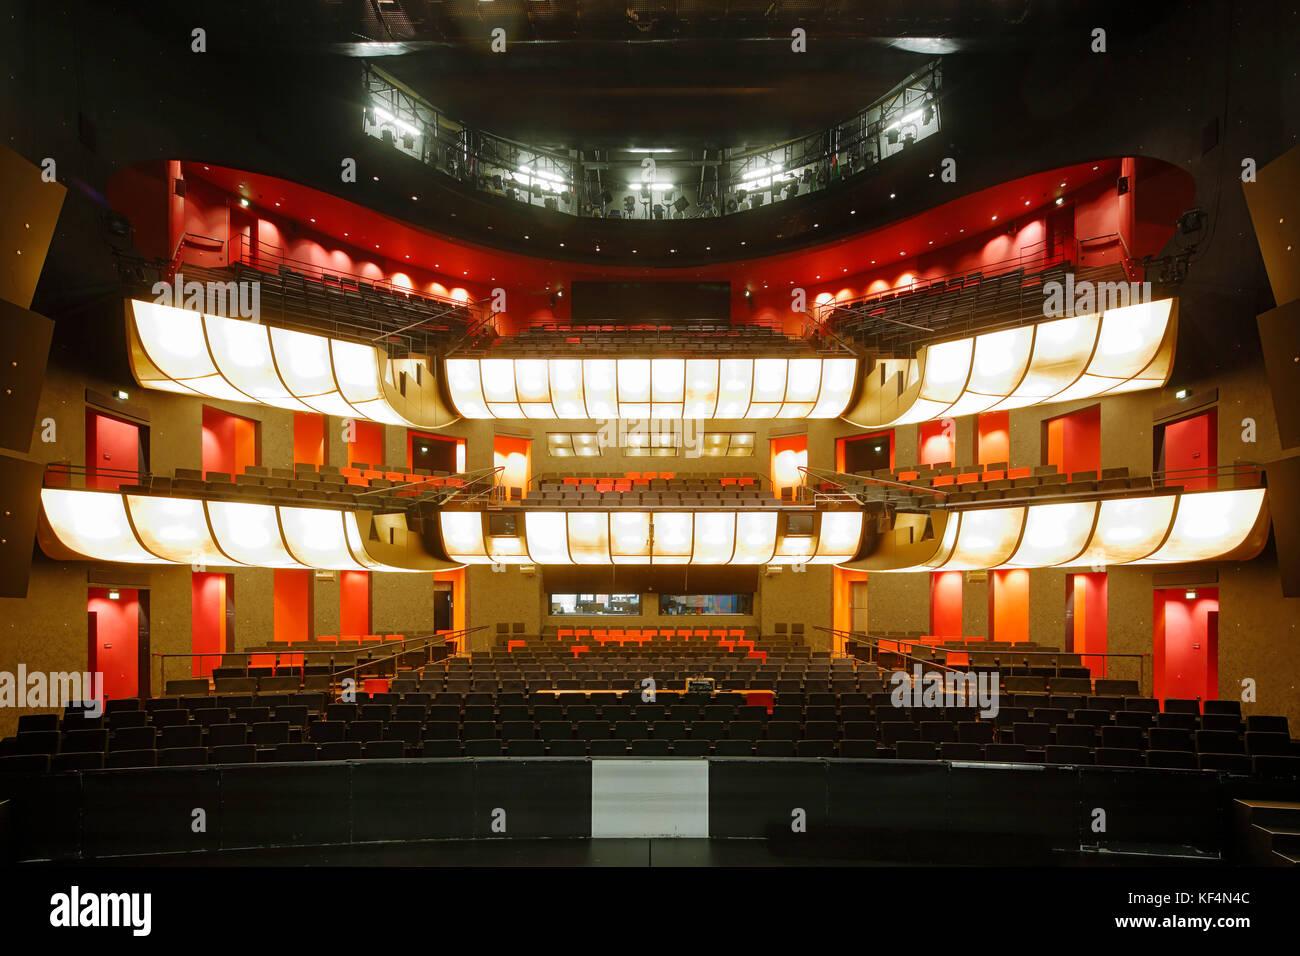 staatstheater in mainz rheinland pfalz grosses haus zuschauerraum stock photo royalty free. Black Bedroom Furniture Sets. Home Design Ideas